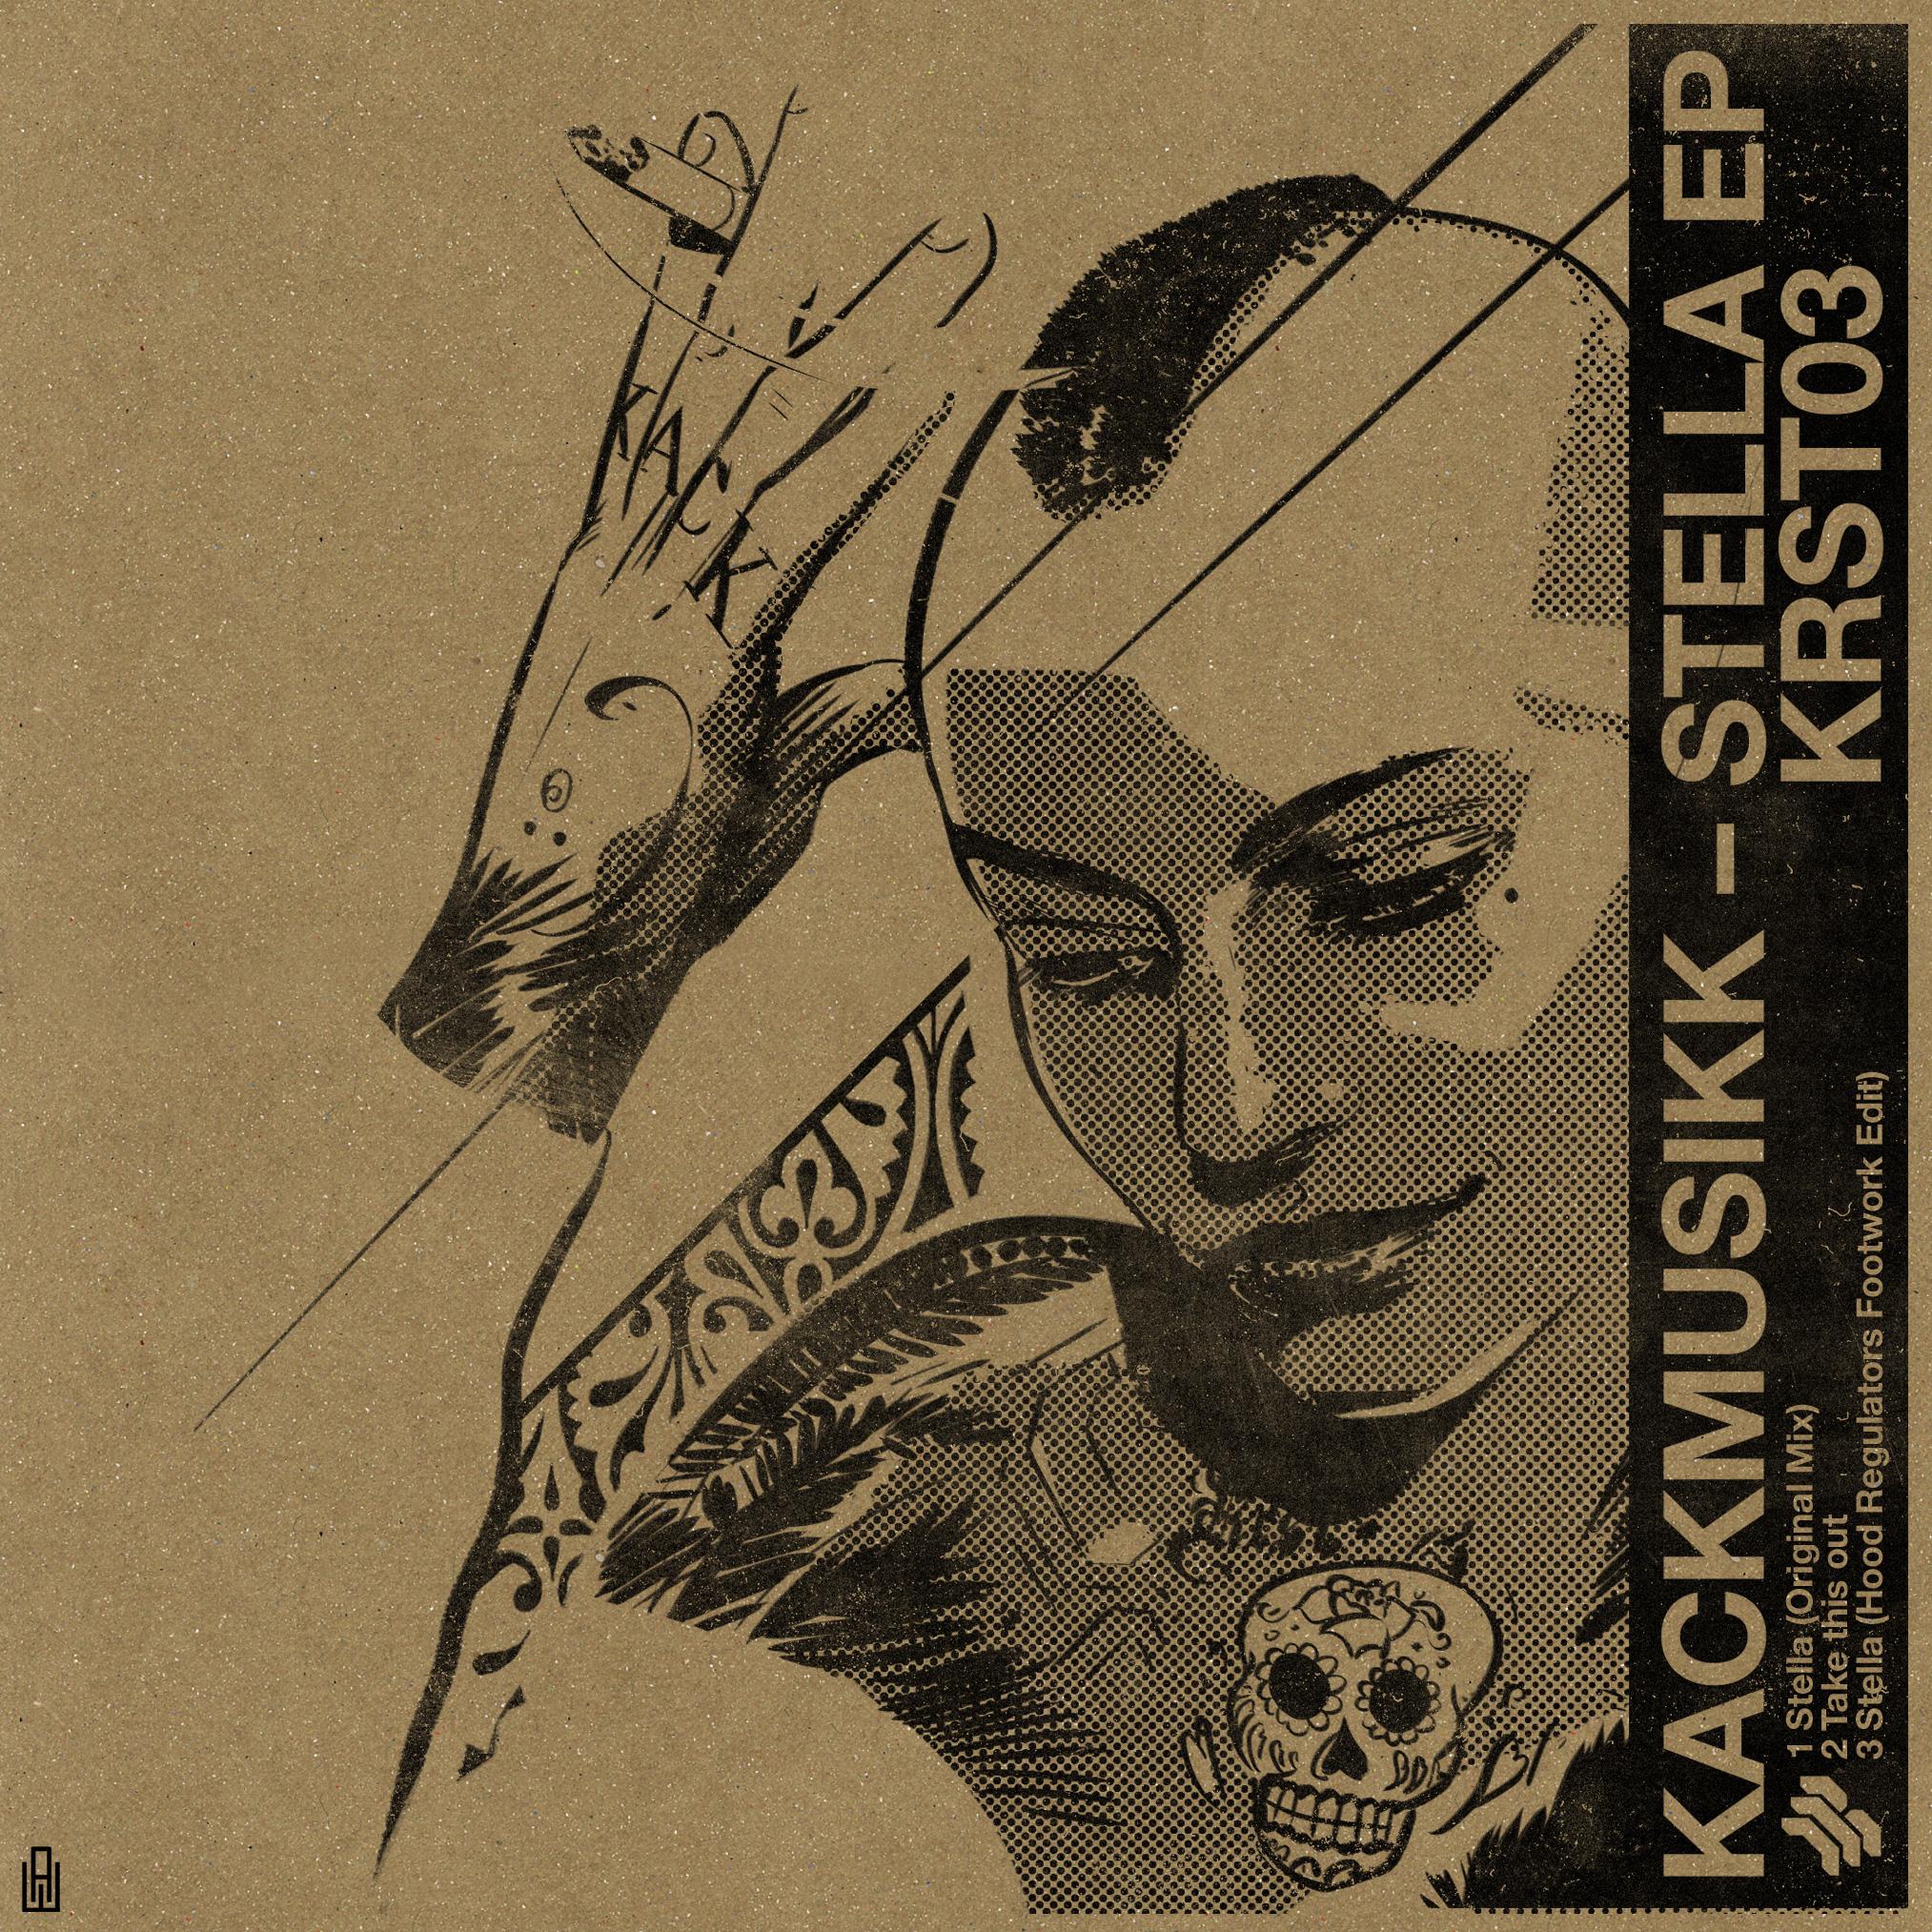 Kackmusikk_Discographie